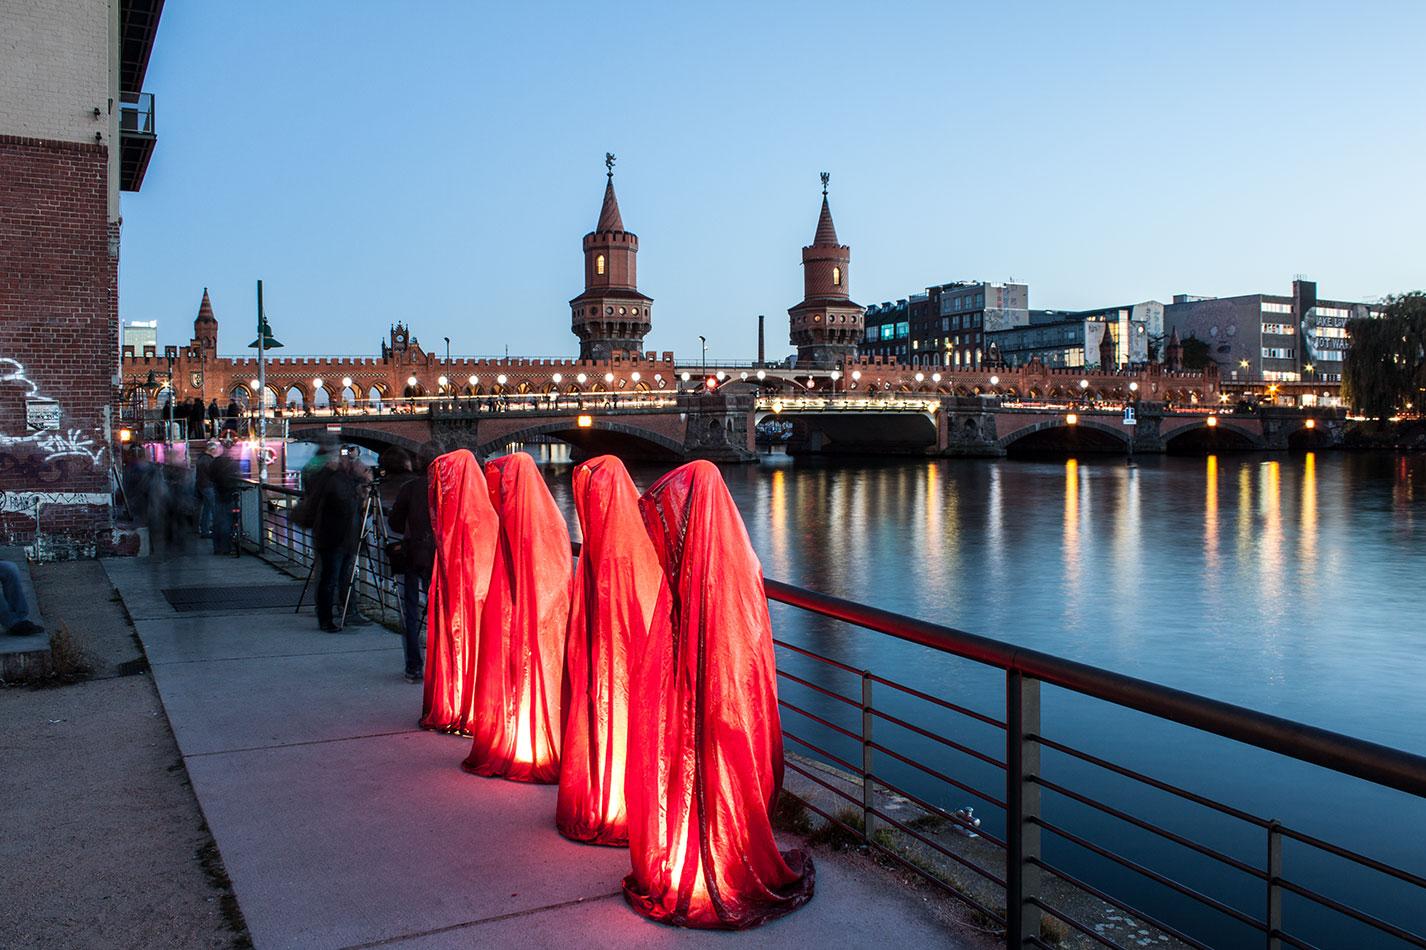 25-years-wallfall-berlin-germany-east-side-gallery-contemporary-fine-art-show-arts-design-guardians-of-time-manfred-kili-kielnhofer-4458